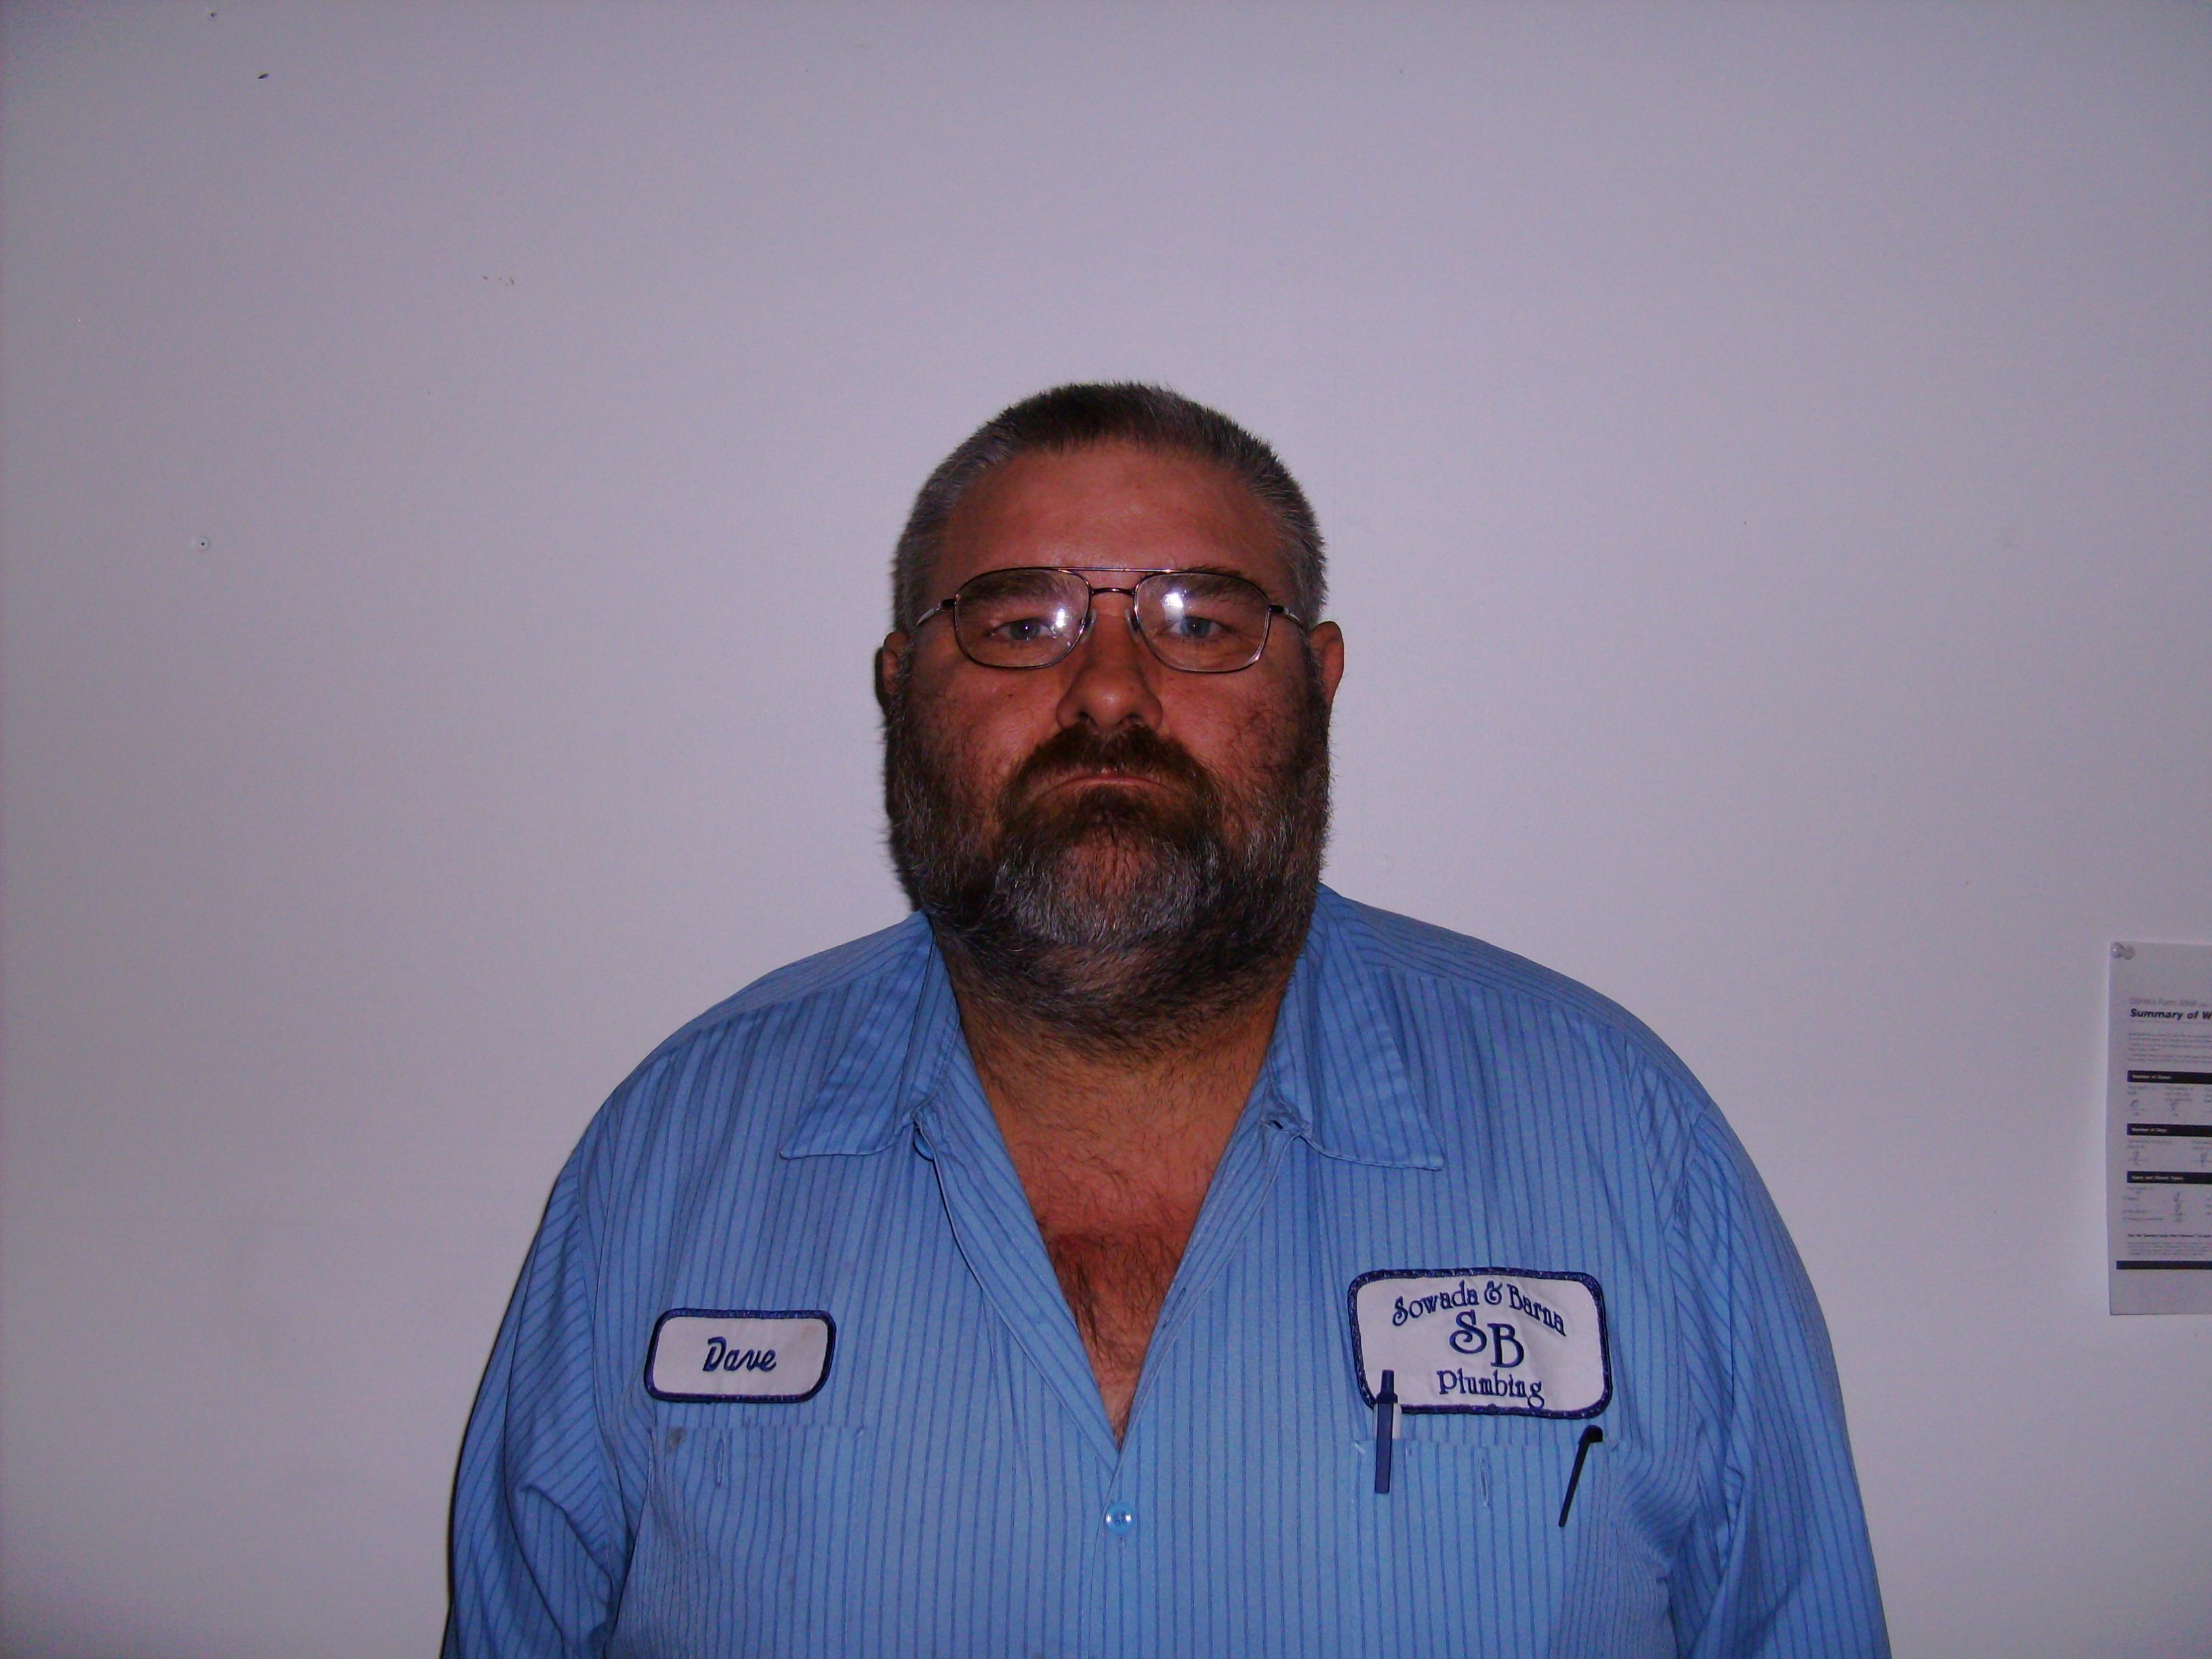 Meet Dave Sowada & Barna Plumbing Staff